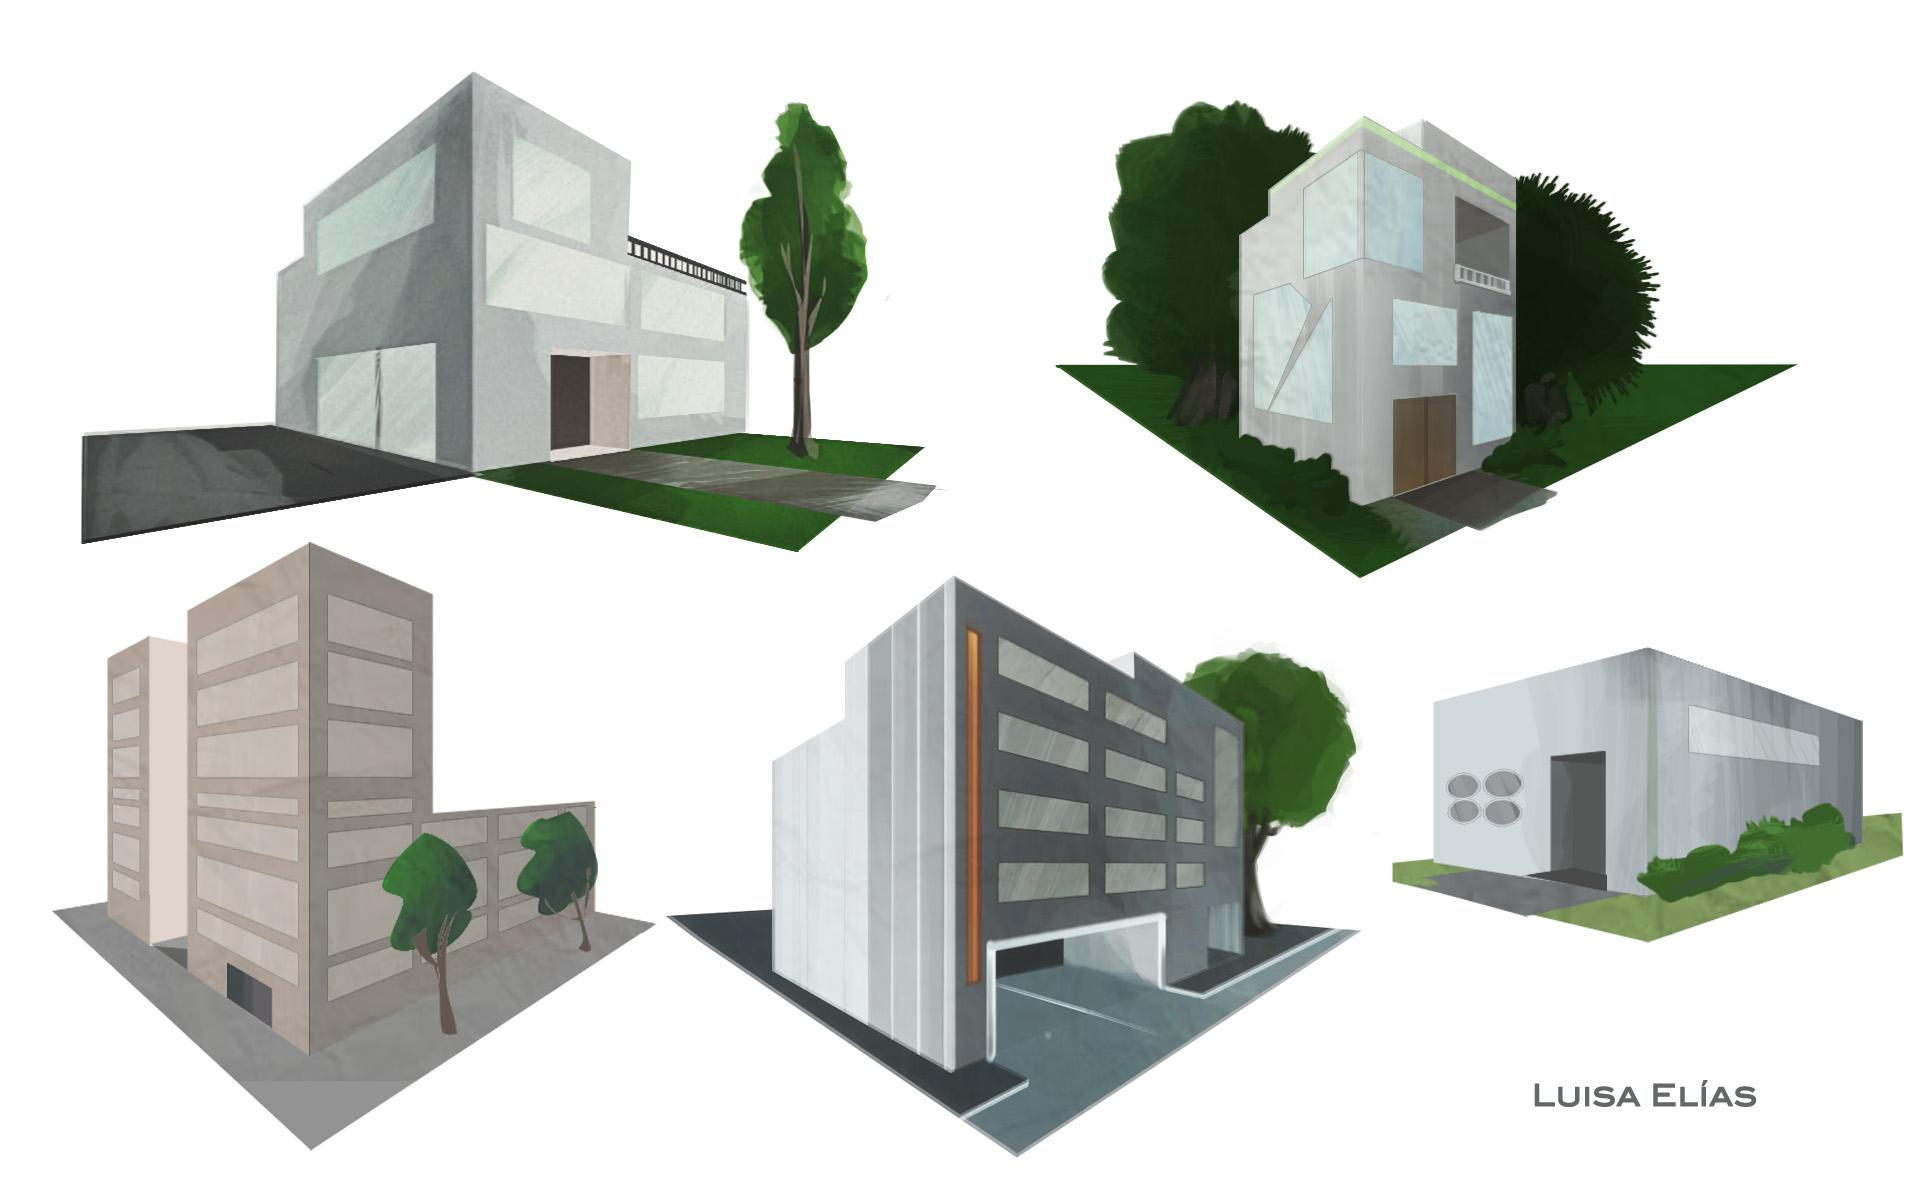 building_sketches_by_ishalia-d7em74v.jpg